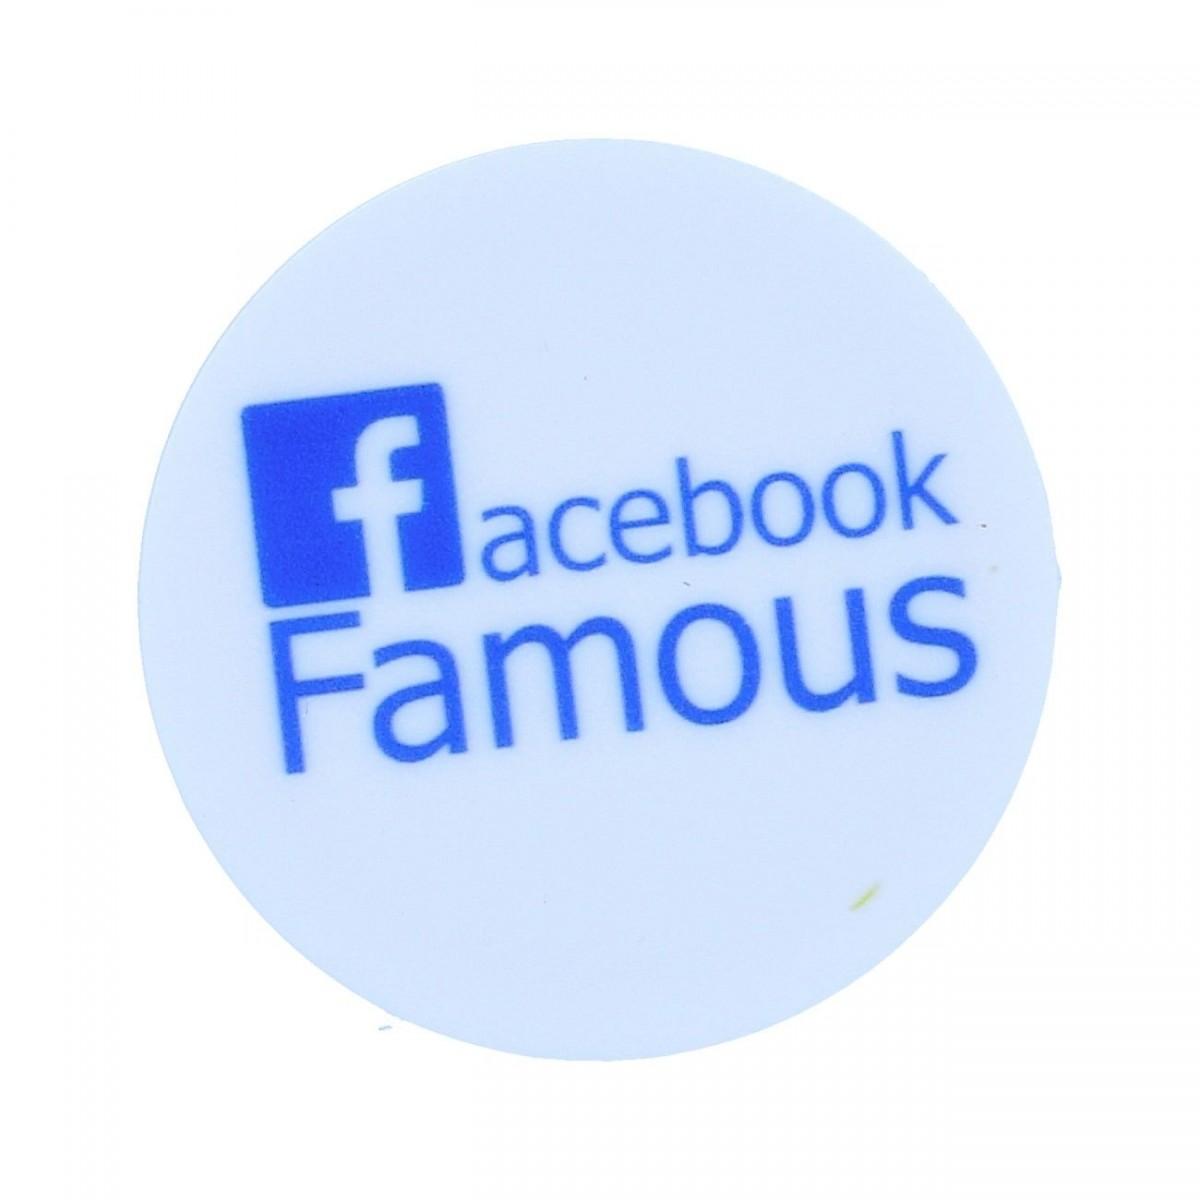 Držák na mobil TopQ PopSocket Facebook Famous 36296